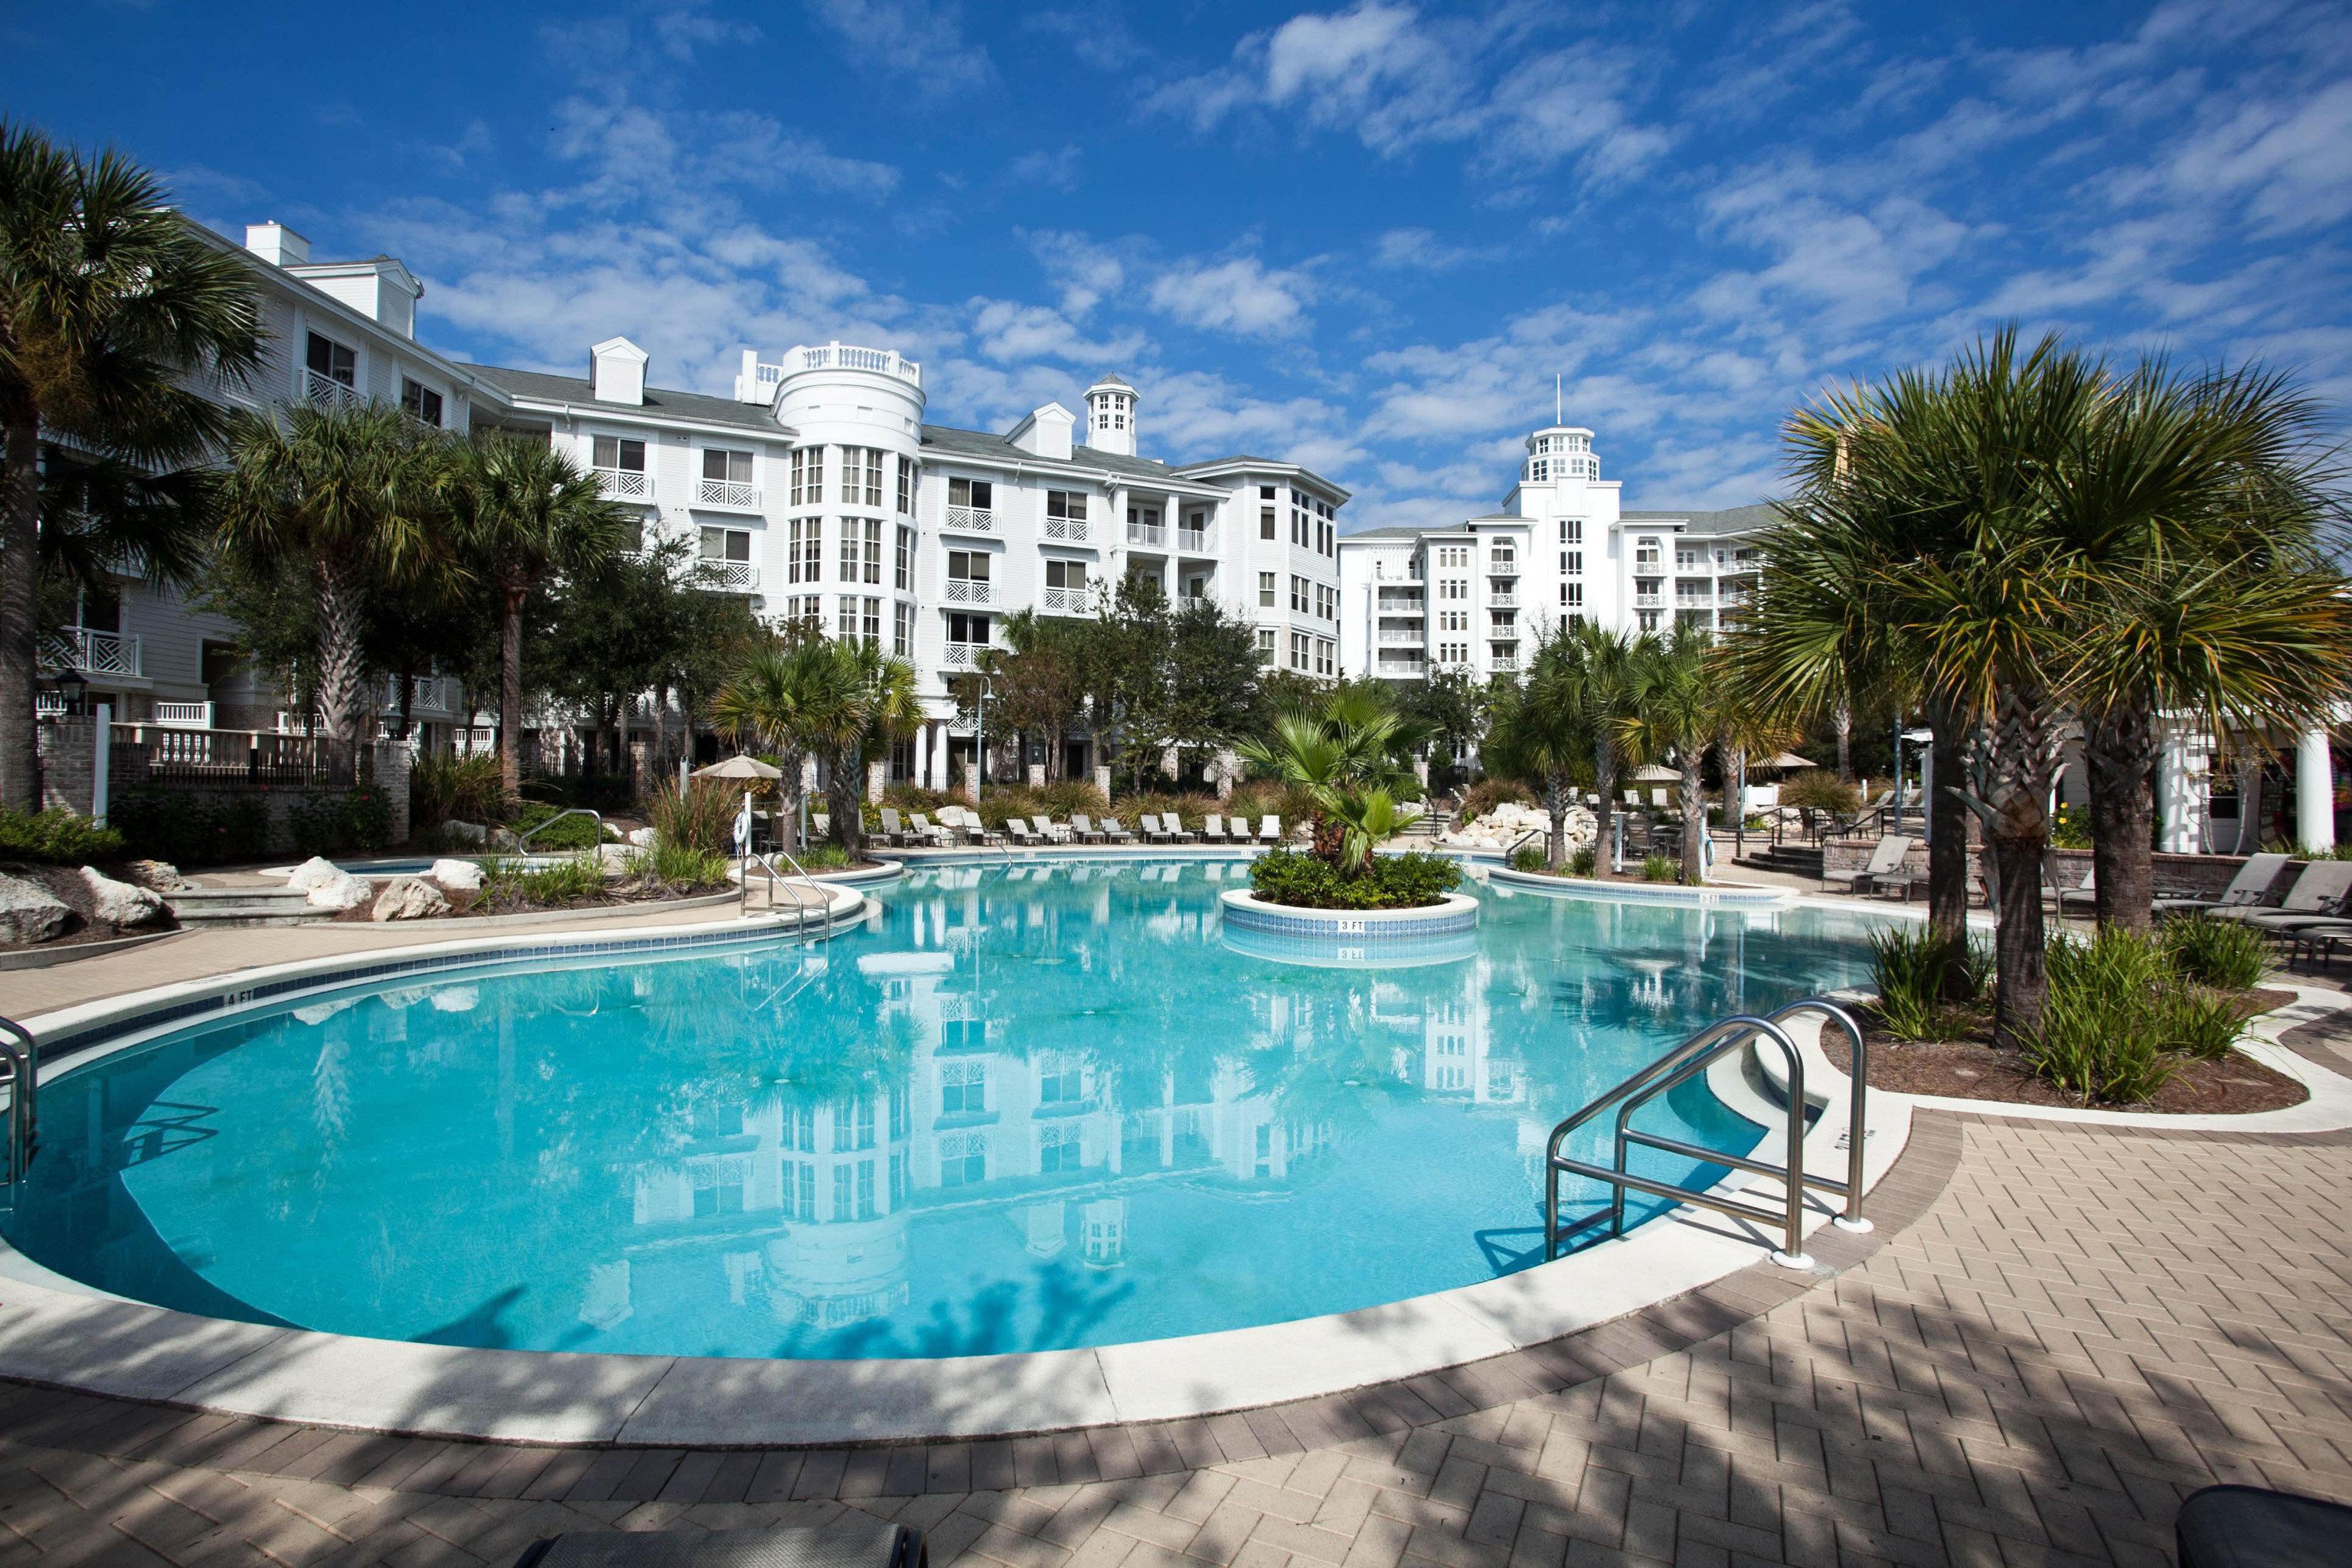 Beach Pool sky ground swimming pool property blue leisure Resort condominium reflecting pool swimming resort town backyard Villa mansion empty